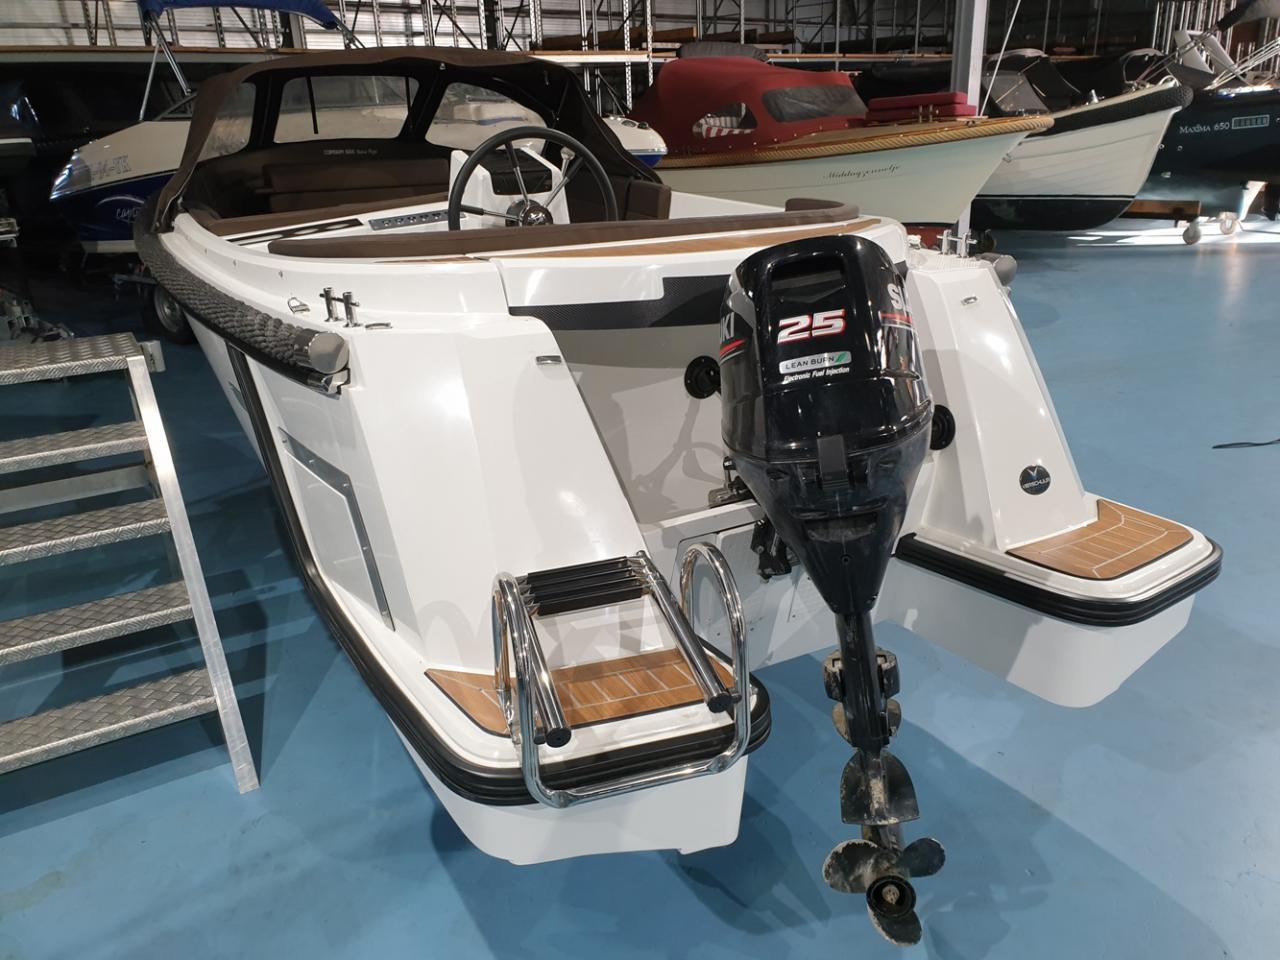 Corsiva 565 tender met Suzuki 25 pk 5